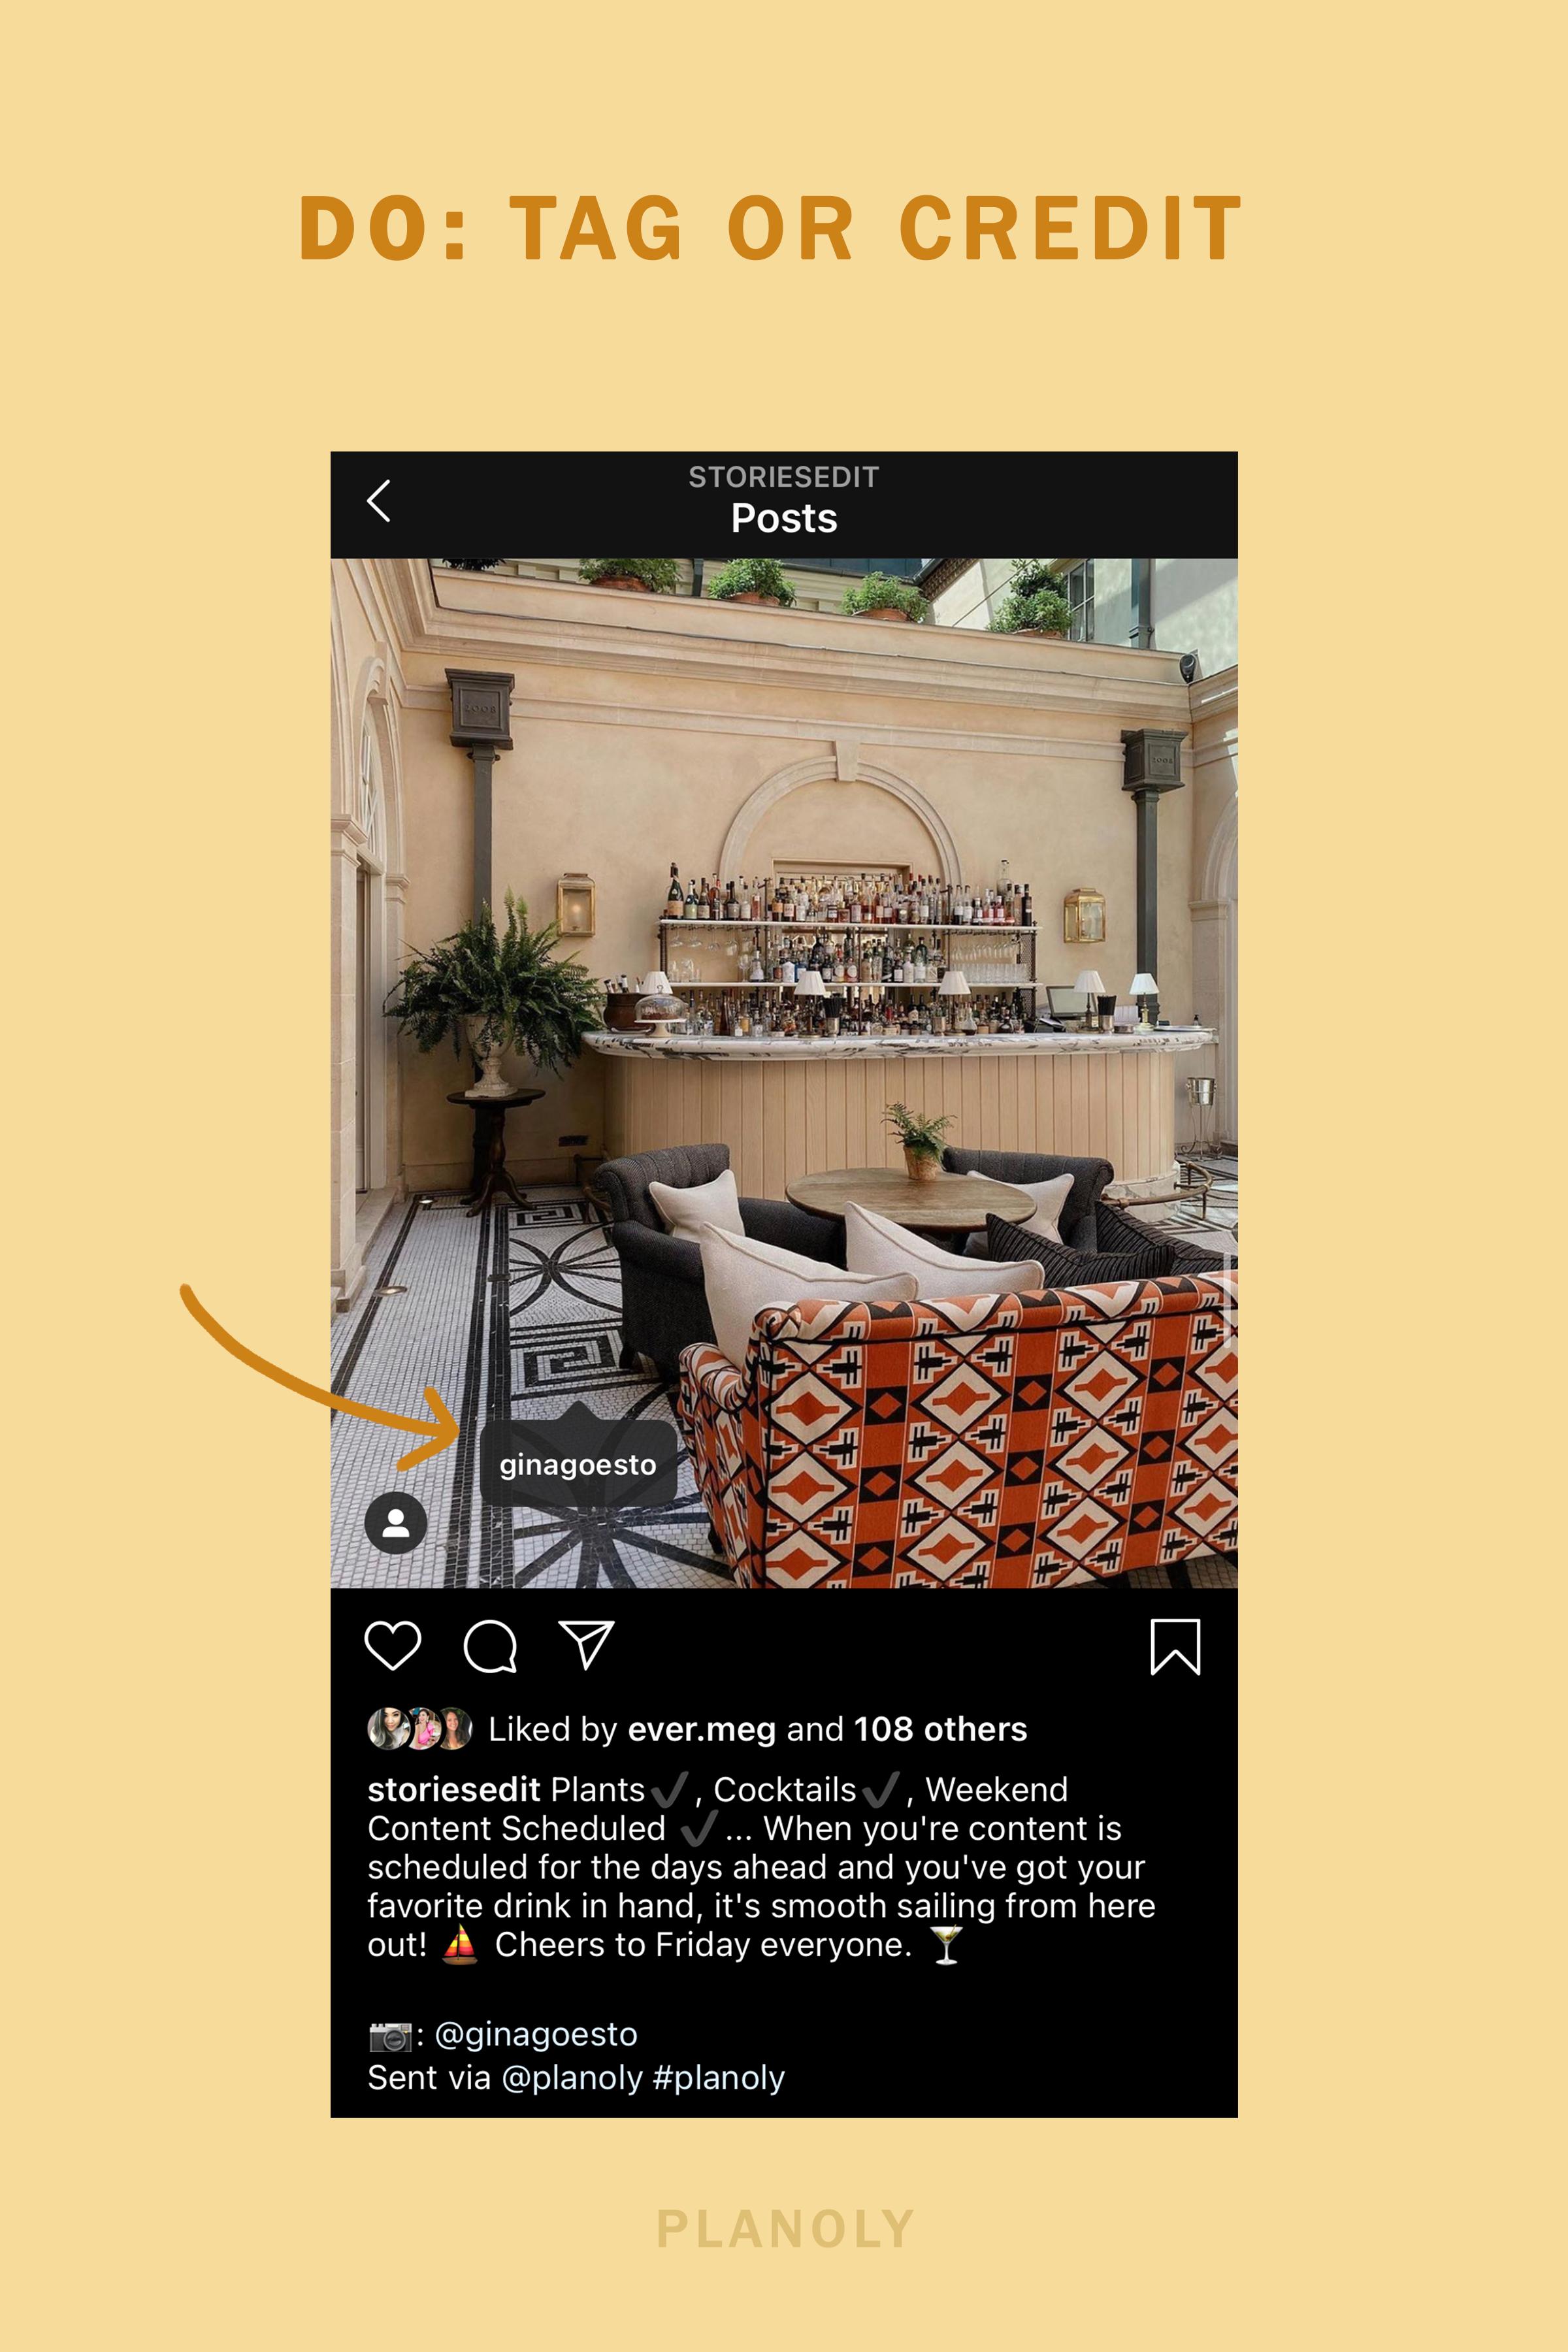 PLANOLY-Blog Post-Intagram Best Practices for Designers-Image 2